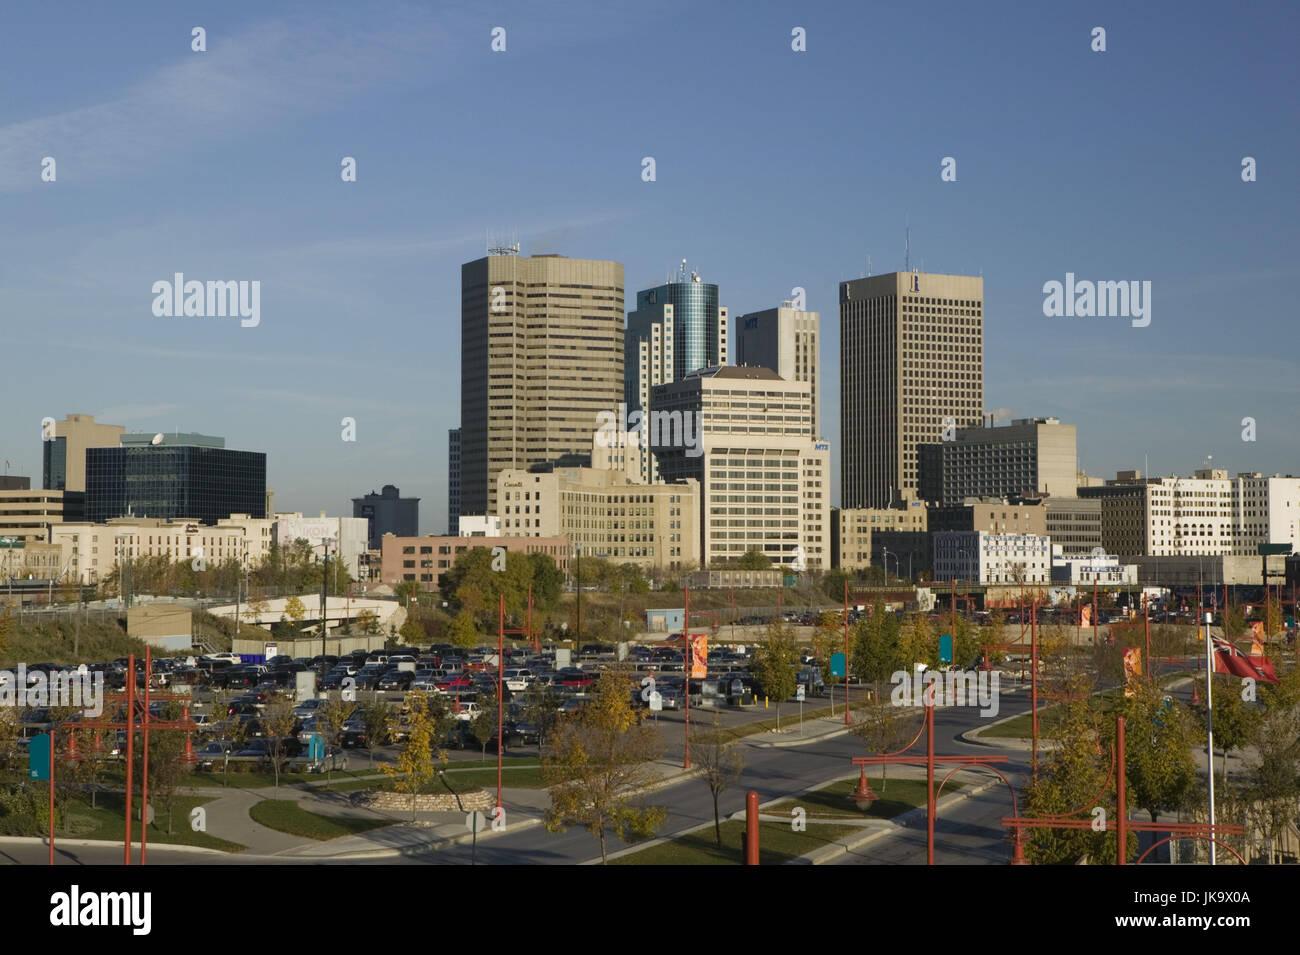 Kanada, Manitoba, Winnipeg, Wolkenkratzer, Abendstimmung - Stock Image